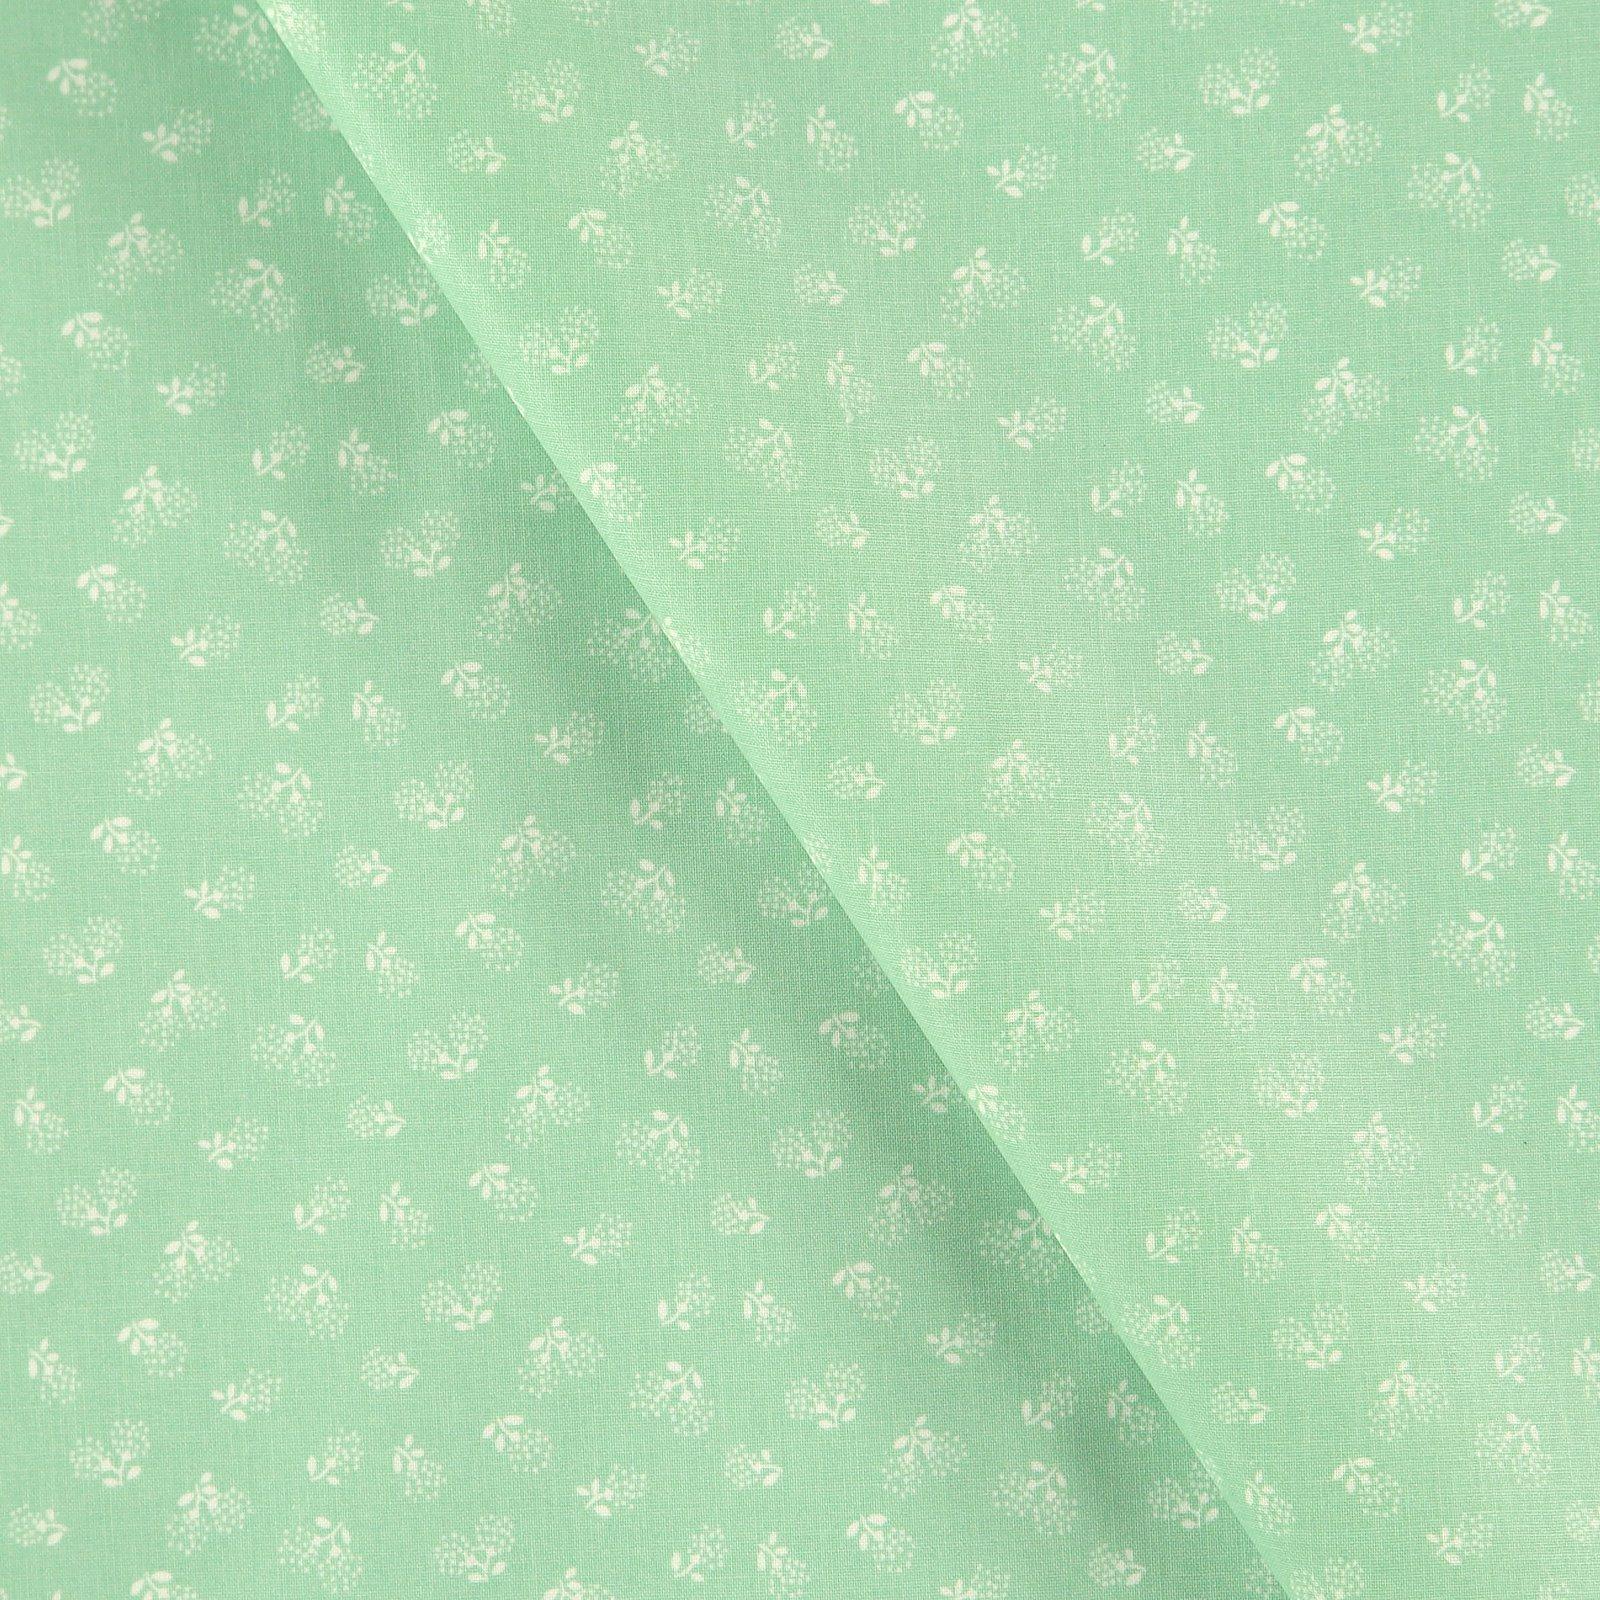 Woven oil cloth mint w flowers